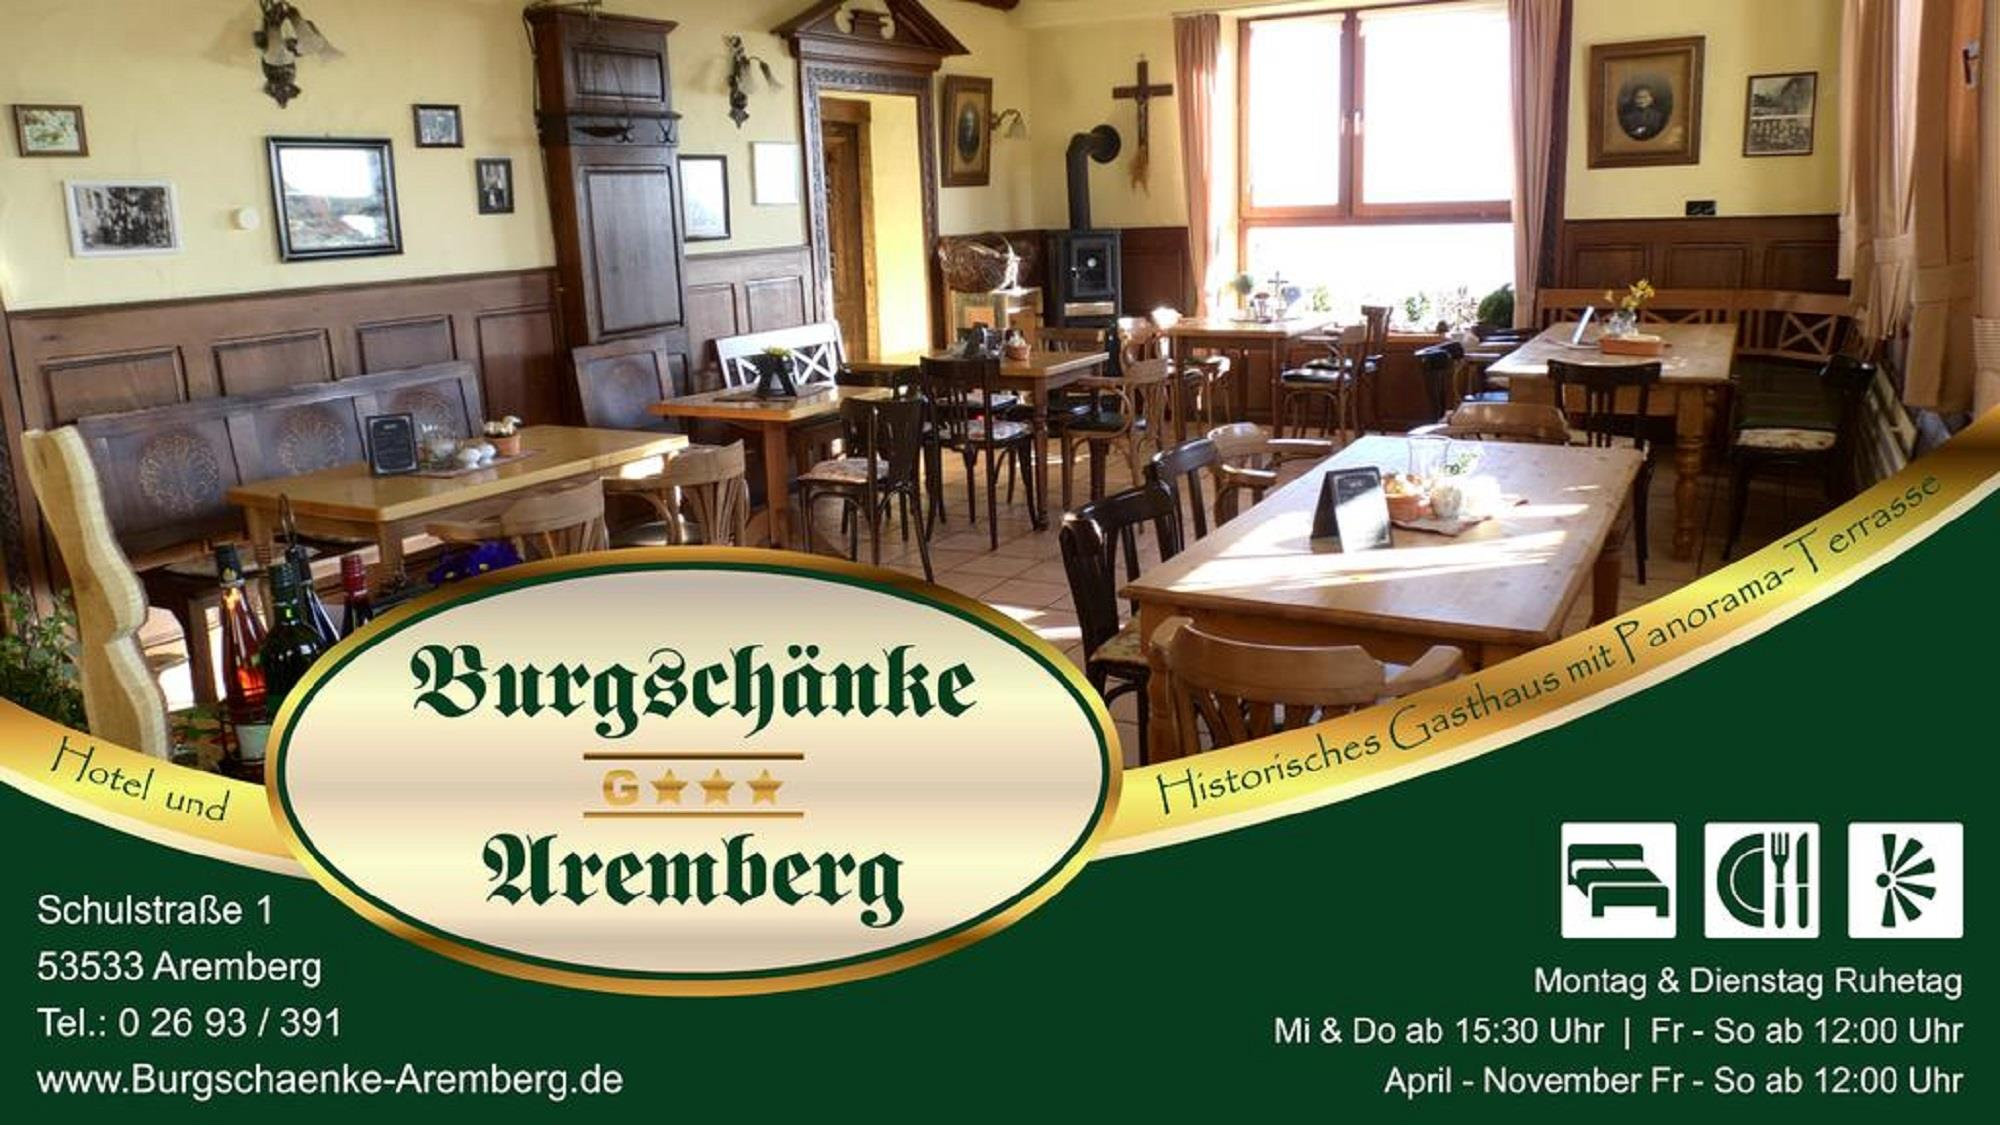 @ Burgschänke Aremberg / Boes